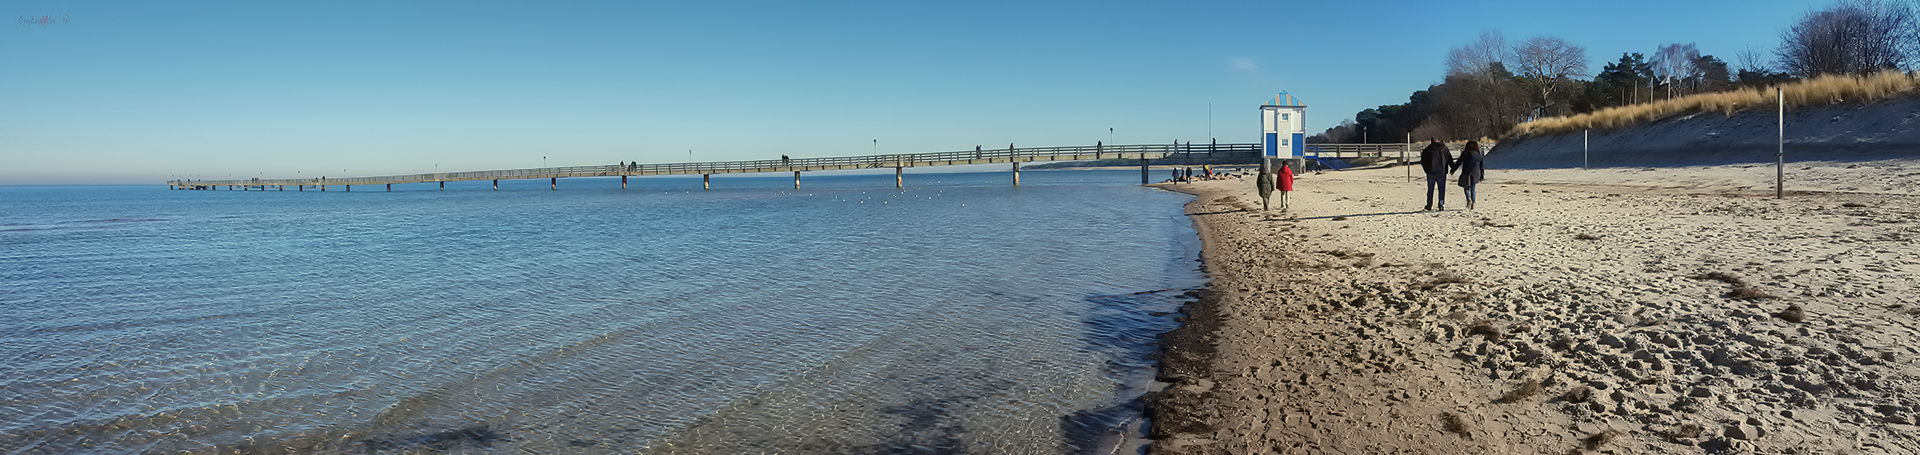 Strand und Seebrücke Lubmin